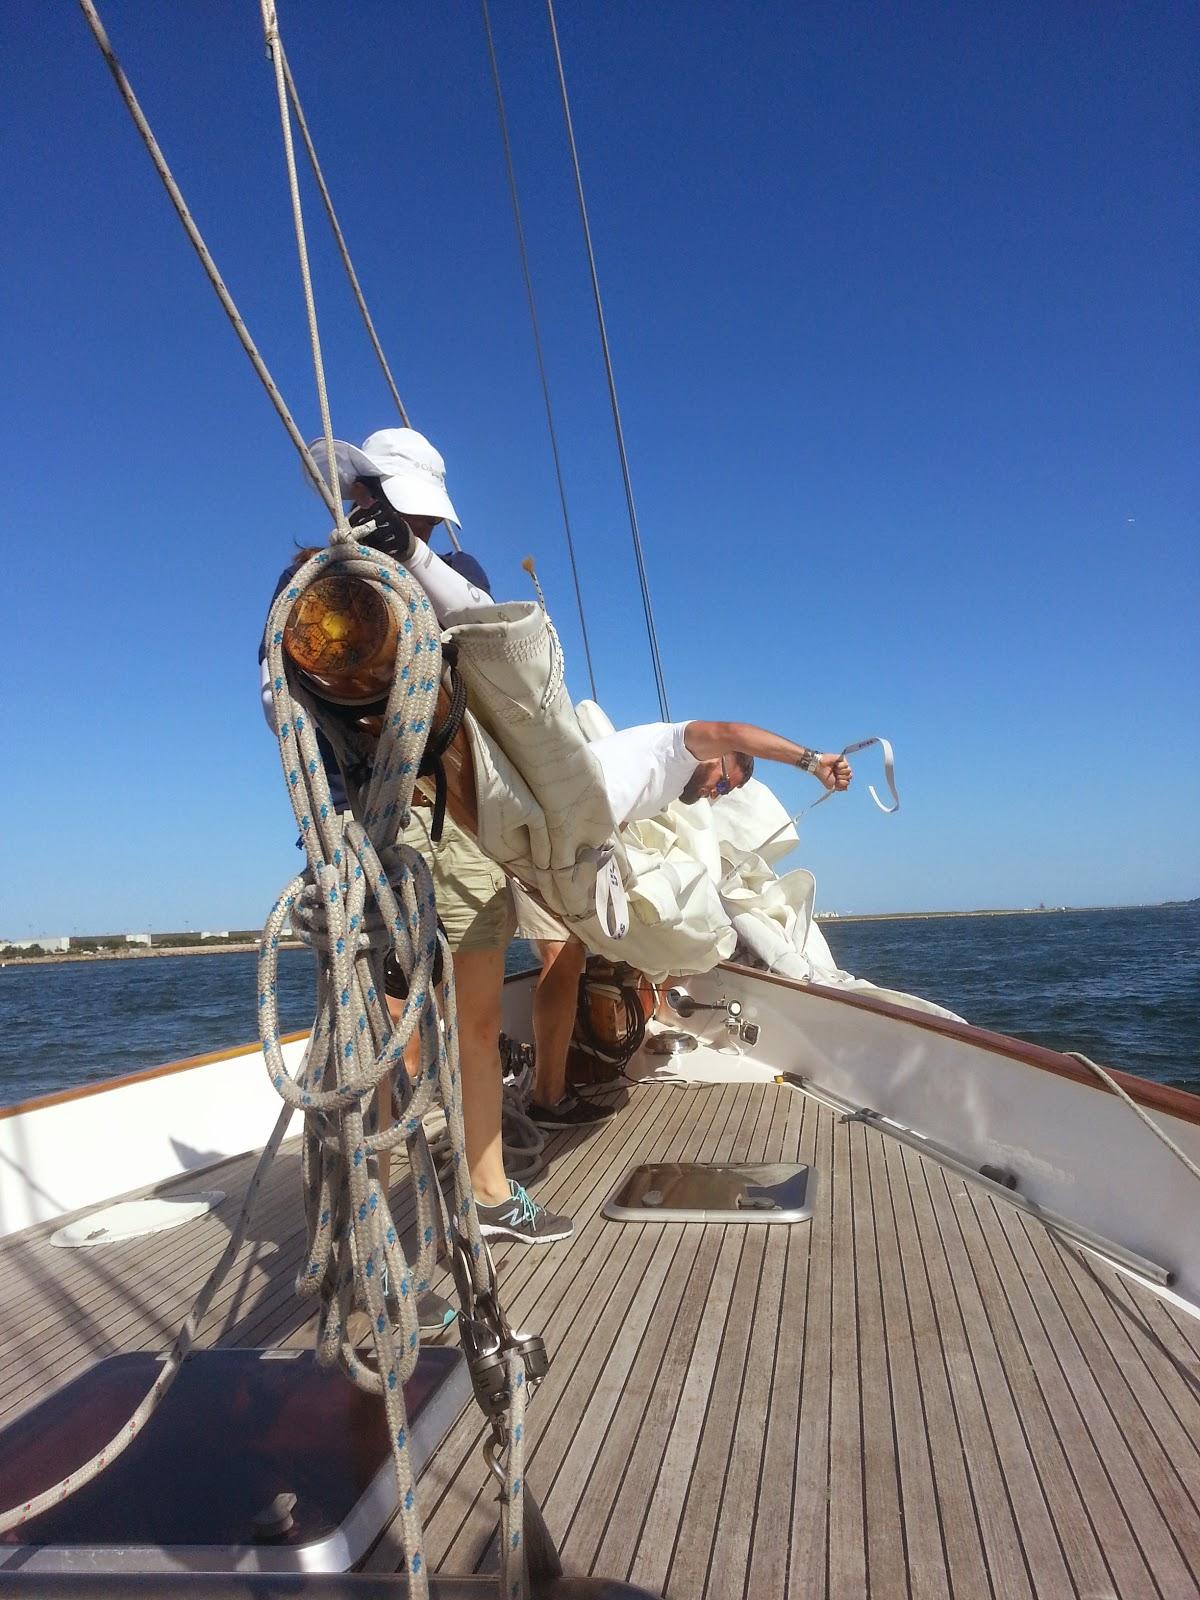 Setting sail on the Adirondack III.